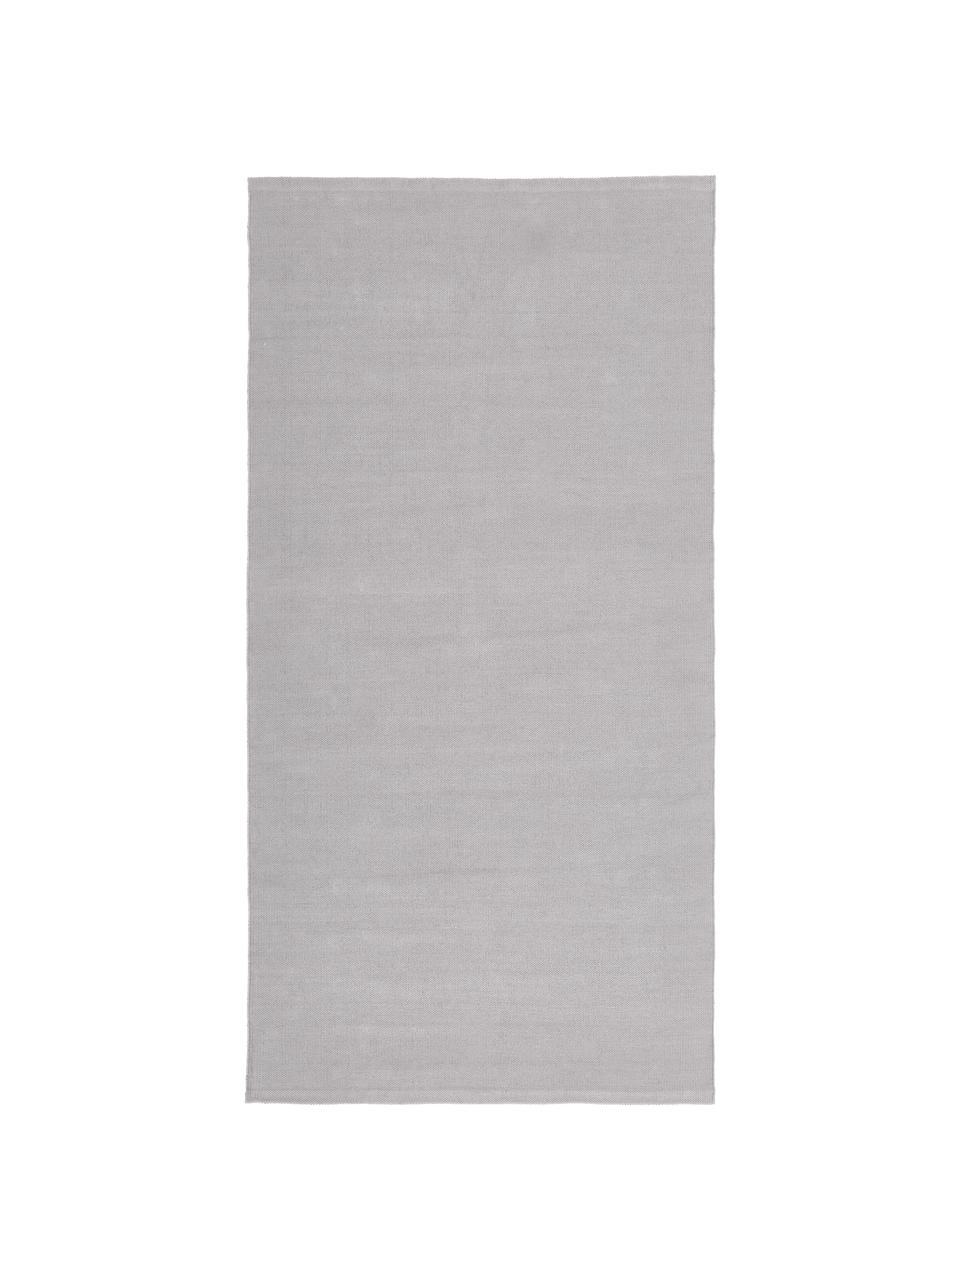 Dun handgeweven katoenen vloerkleed Agneta, 100% katoen, Grijs, B 200 x L 300 cm (maat L)